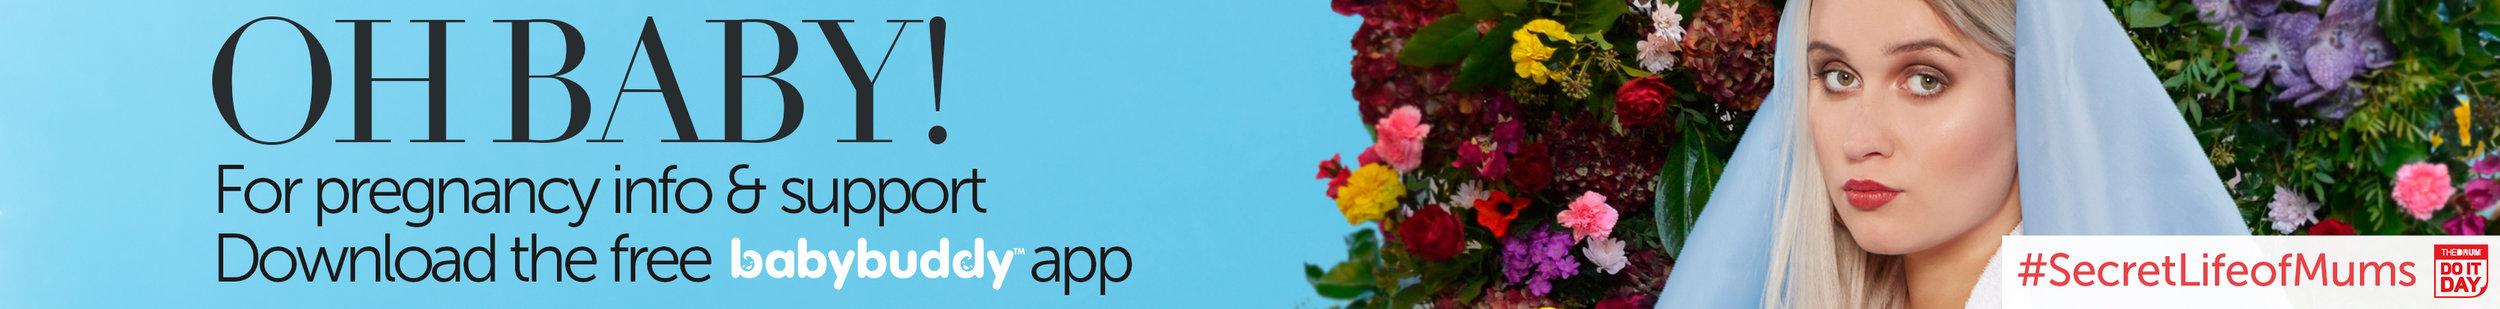 Michael Hilbrown Florist - Best Beginings Campaign - Banner.jpg